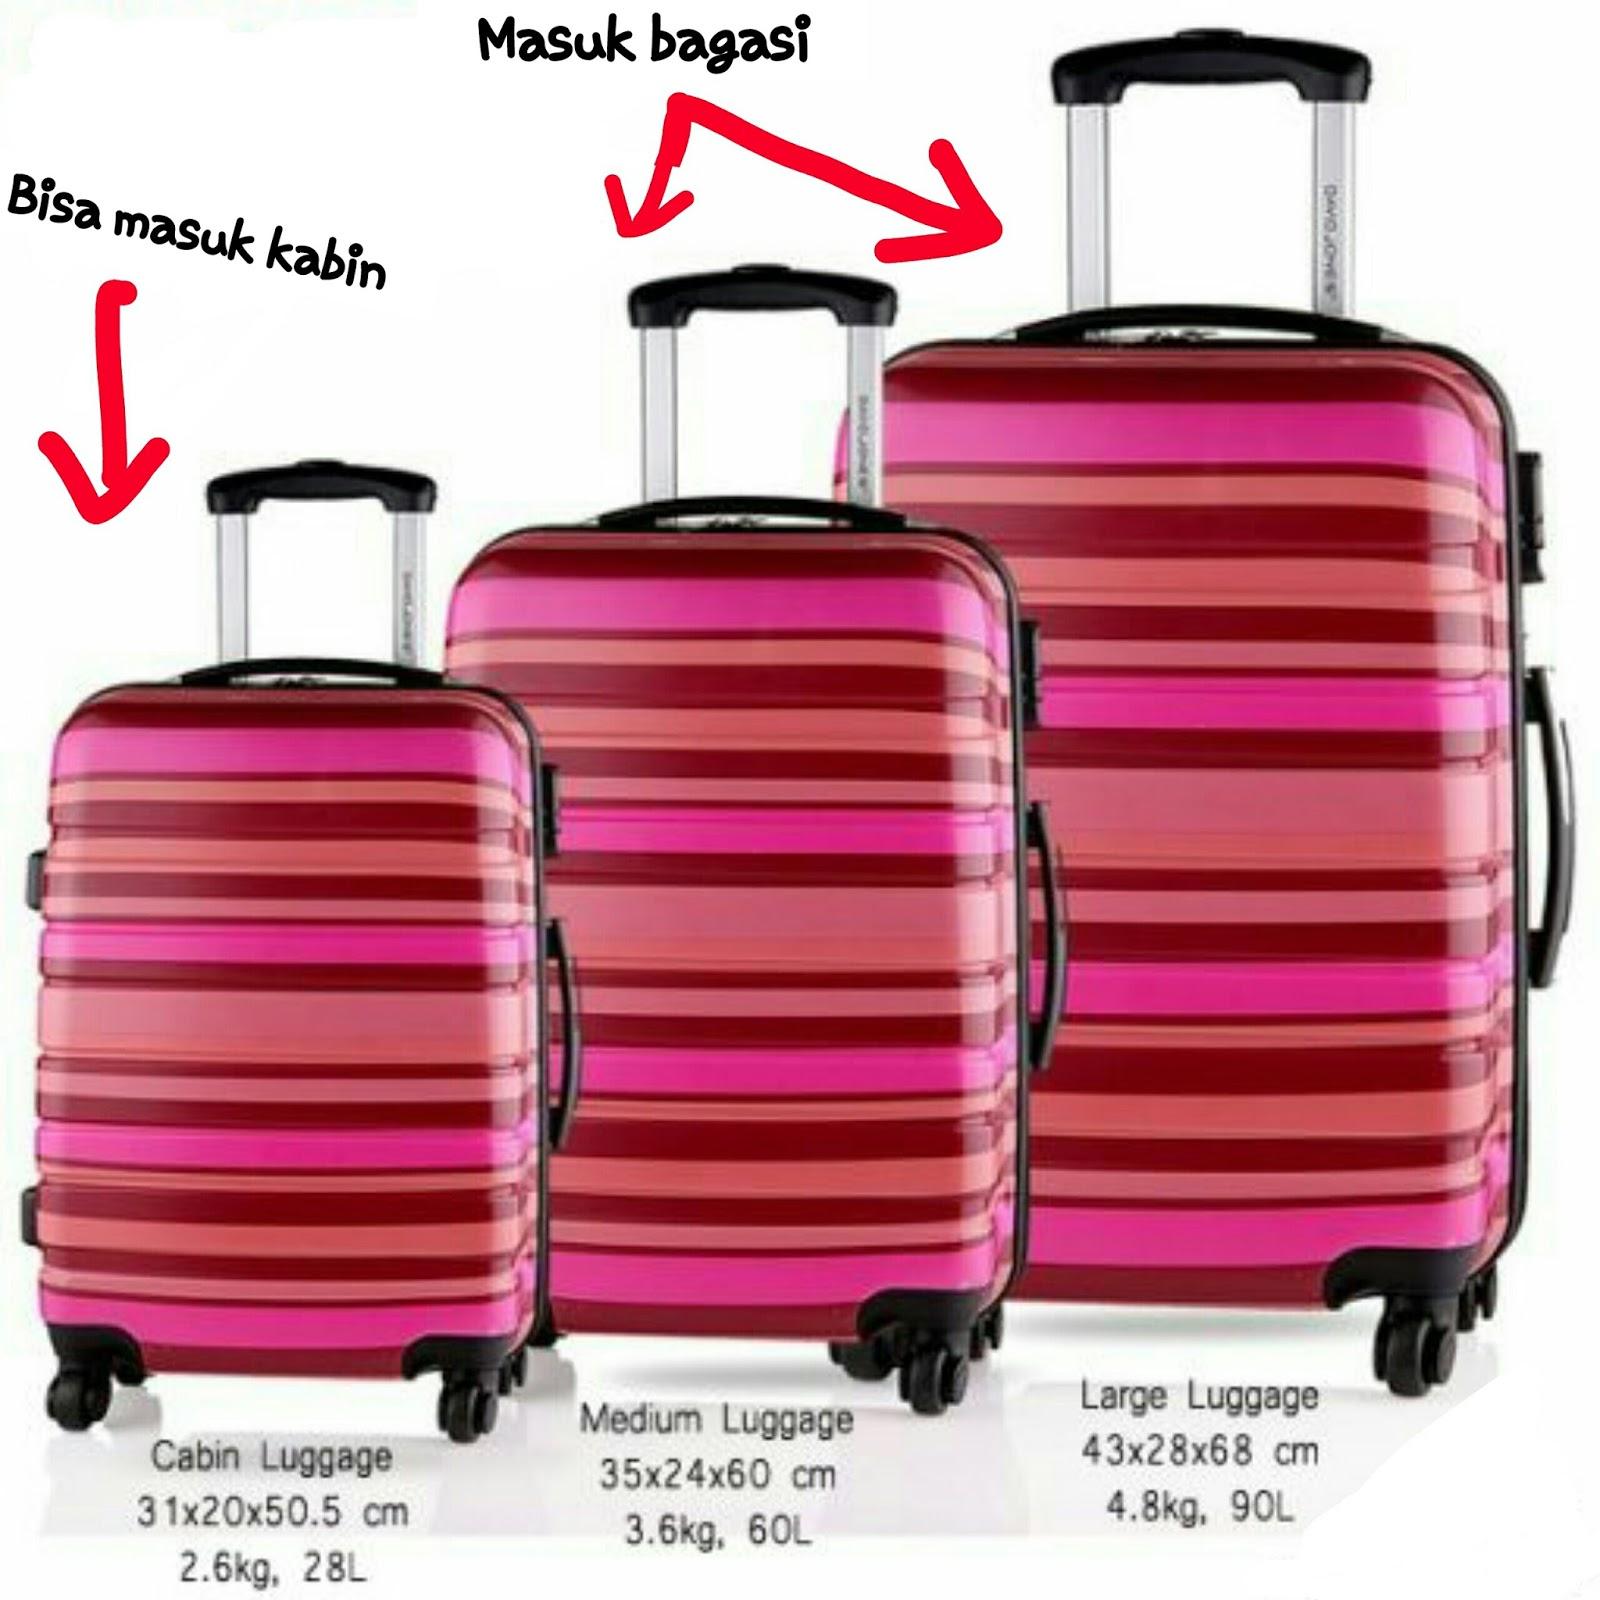 3 ukuran travel bag ya